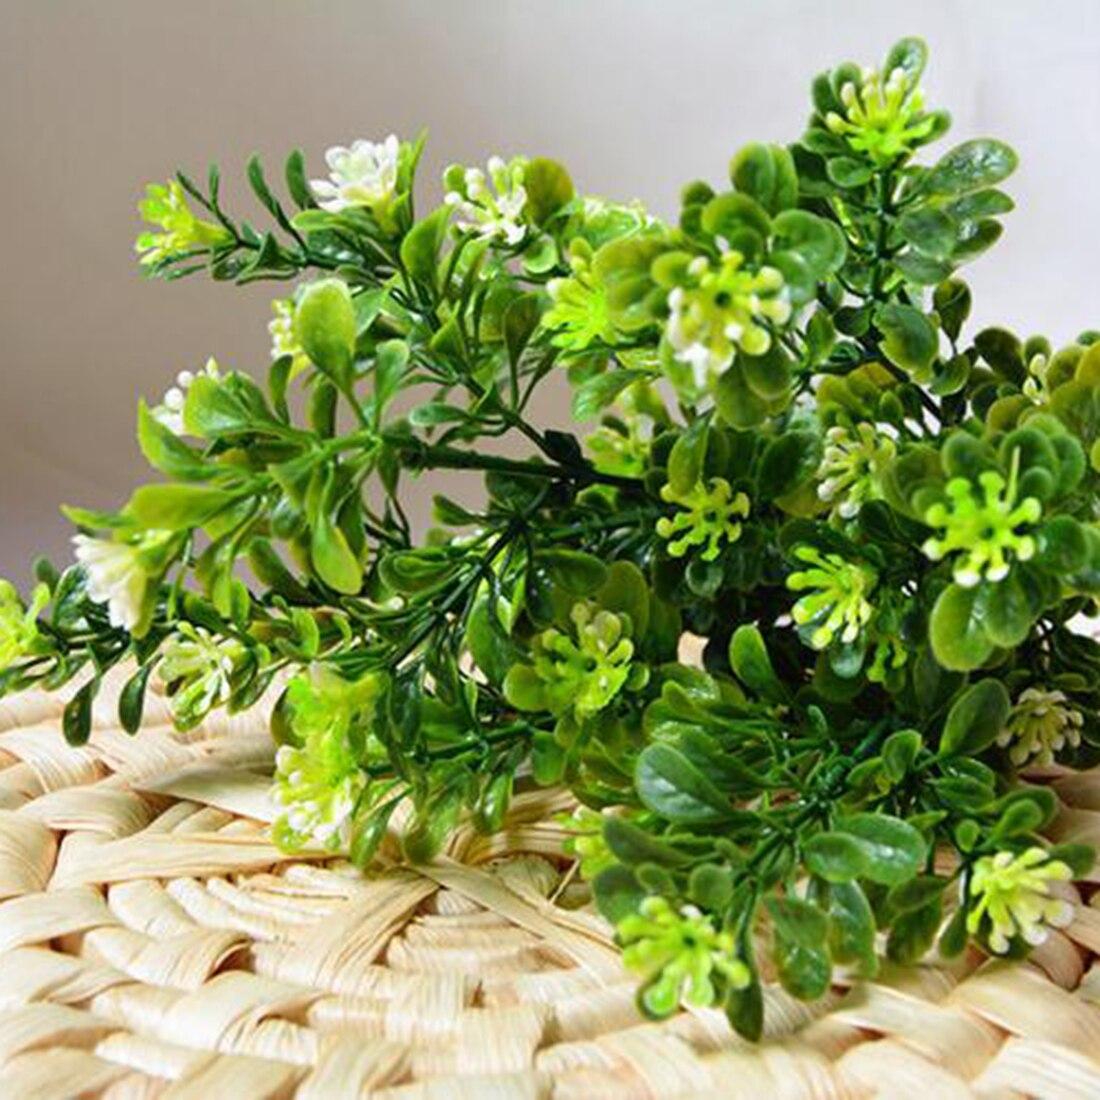 Fashion 7 Branch/Bouquet 35 Heads Artificial Green Plant Fake Milan Grass Bonsai Decoration Leaf Corner Lawn Decoration